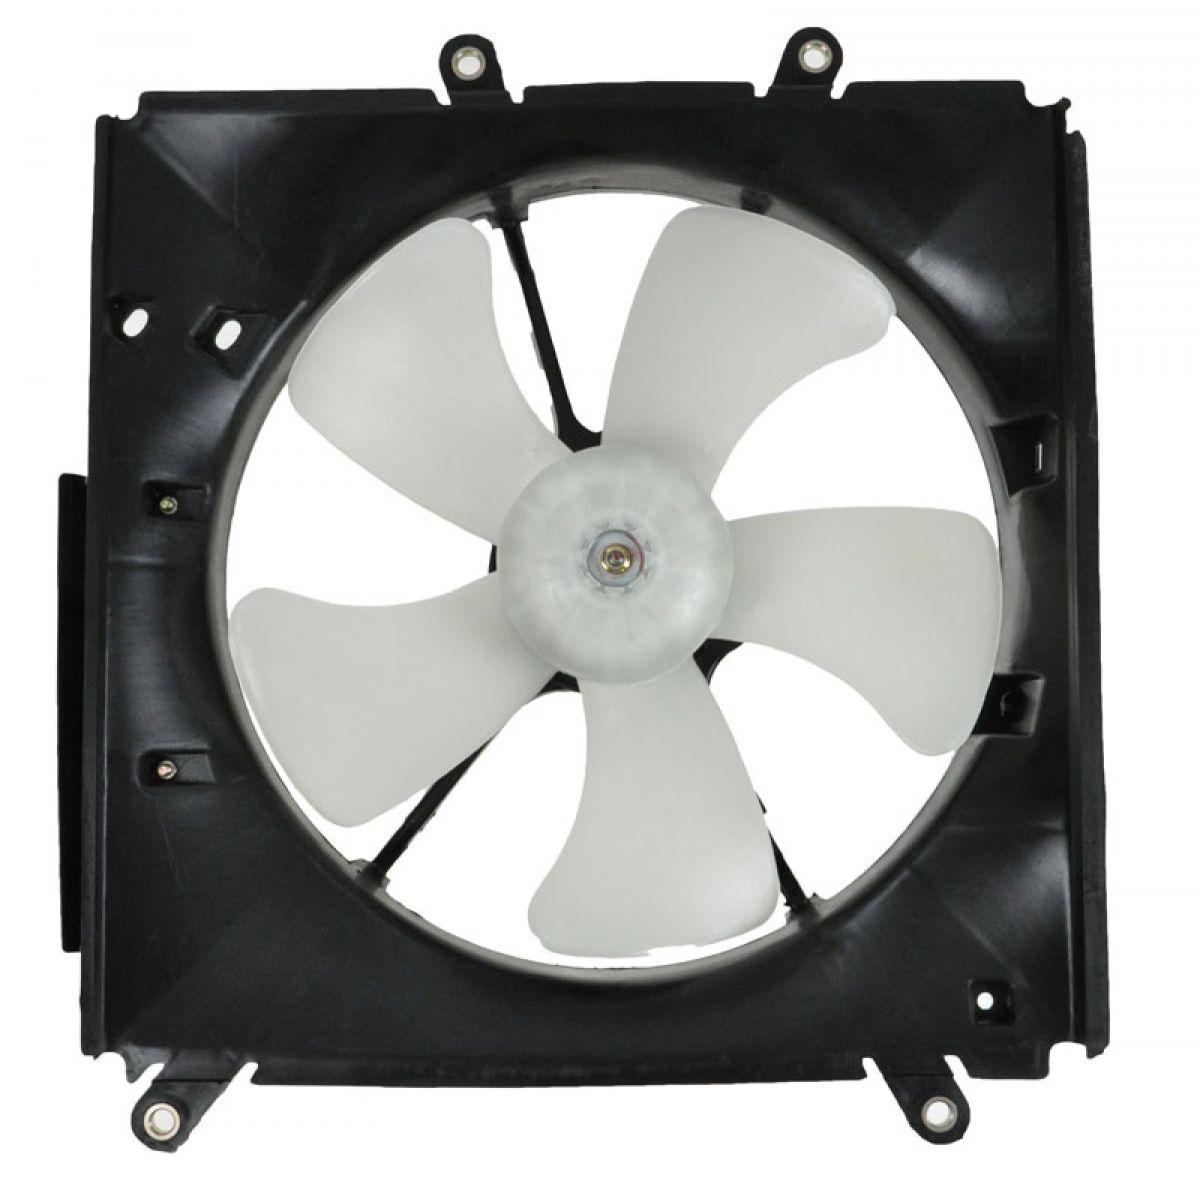 Radiator cooling fan motor assembly for 93 97 toyota for Radiator fan motor price